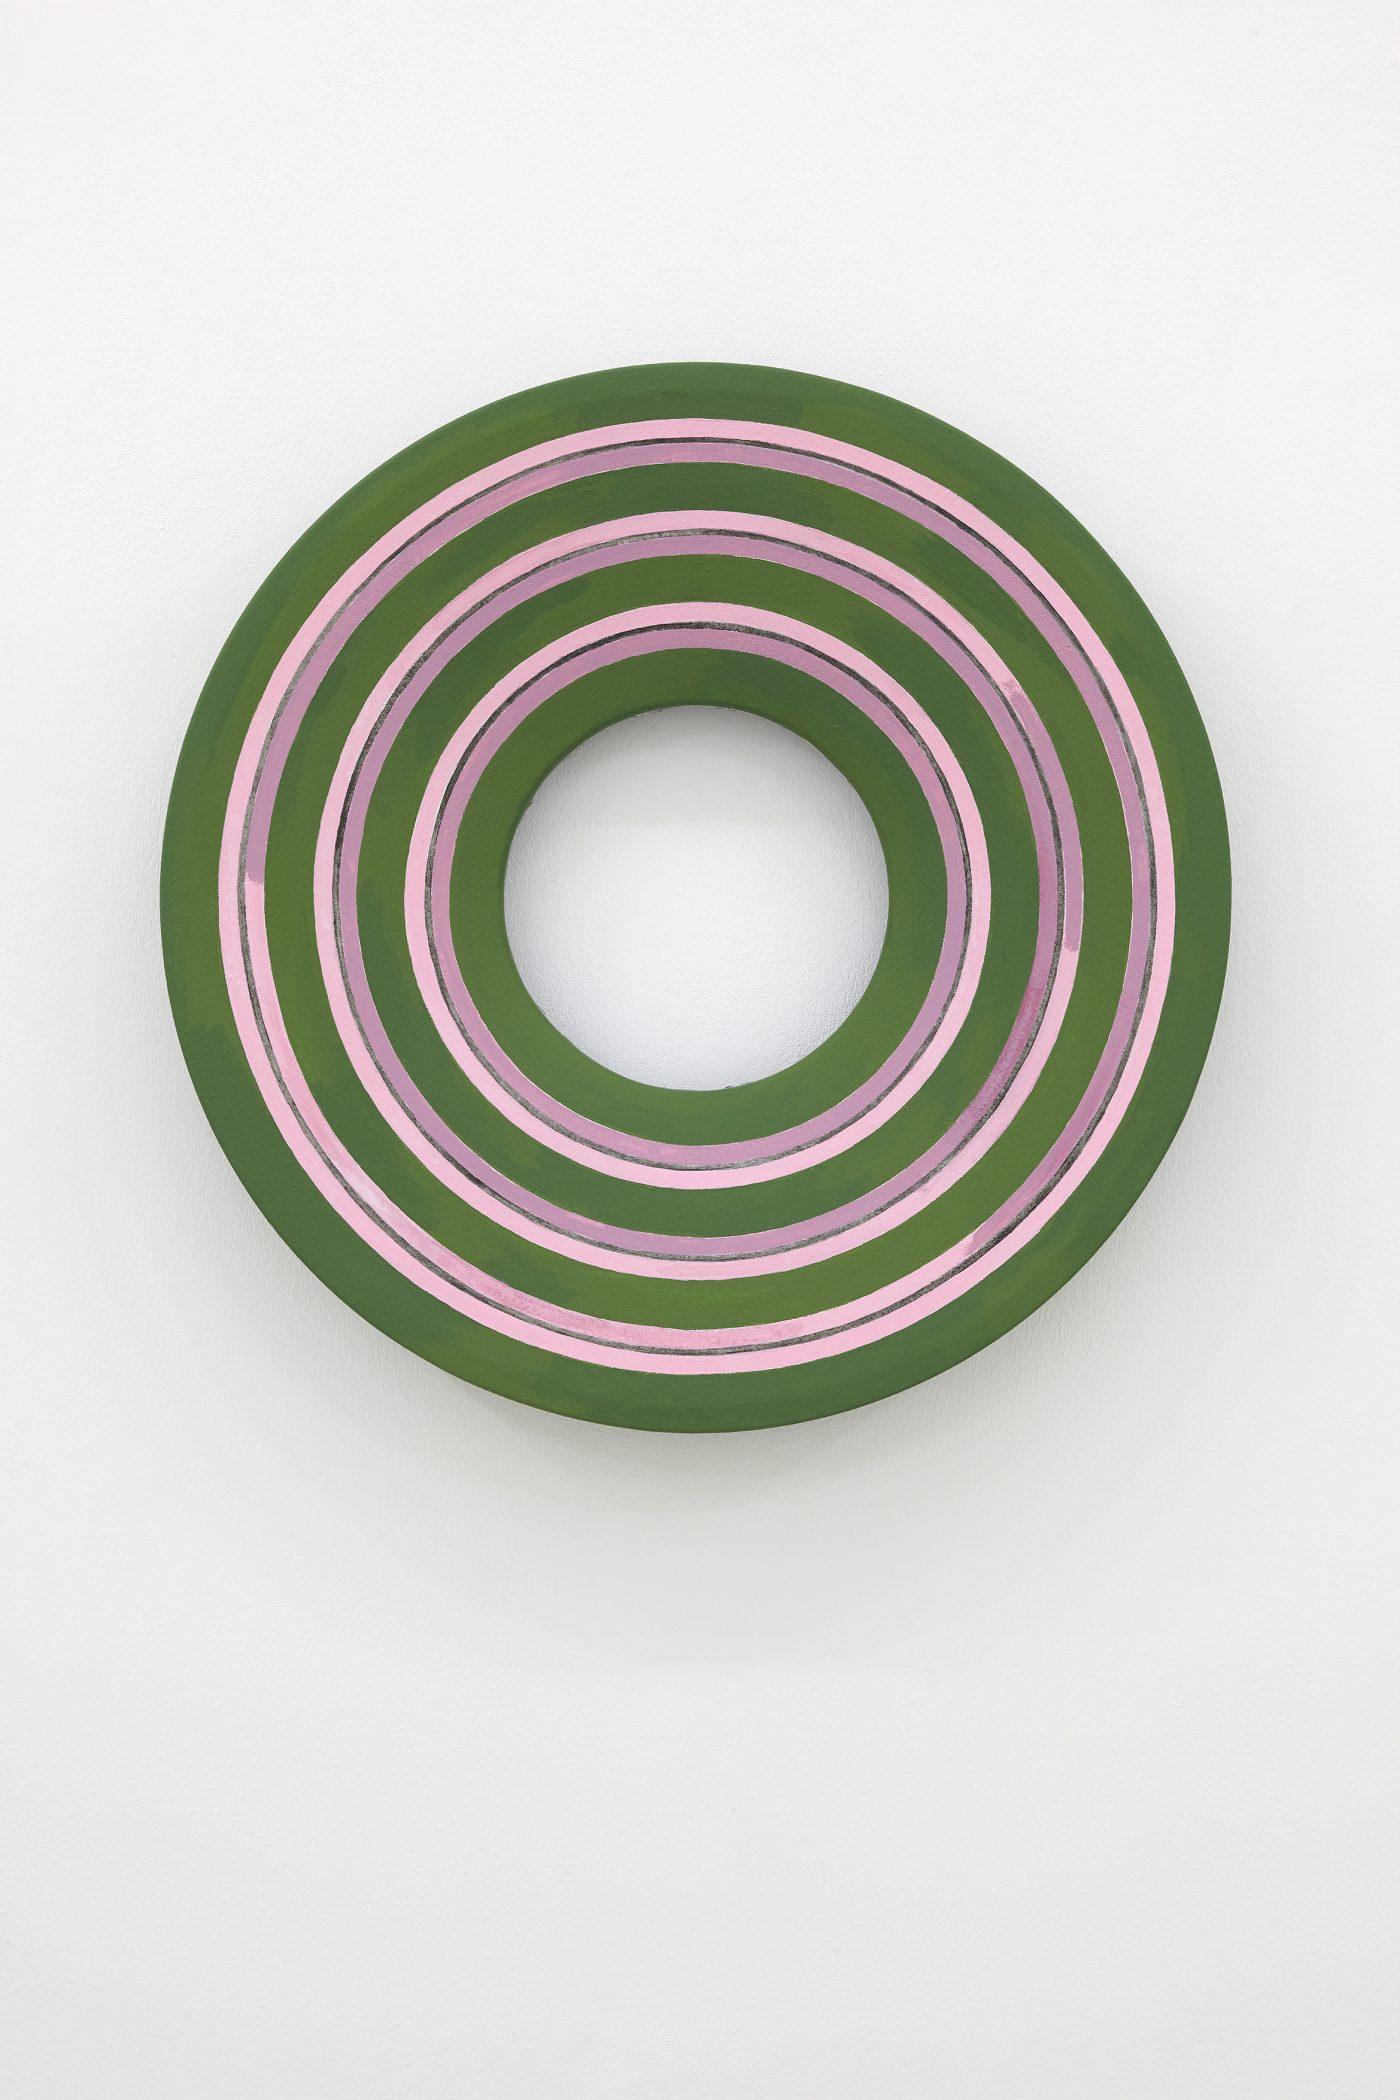 Galerie Lange + Pult – Blair Thurman / Justin Adian